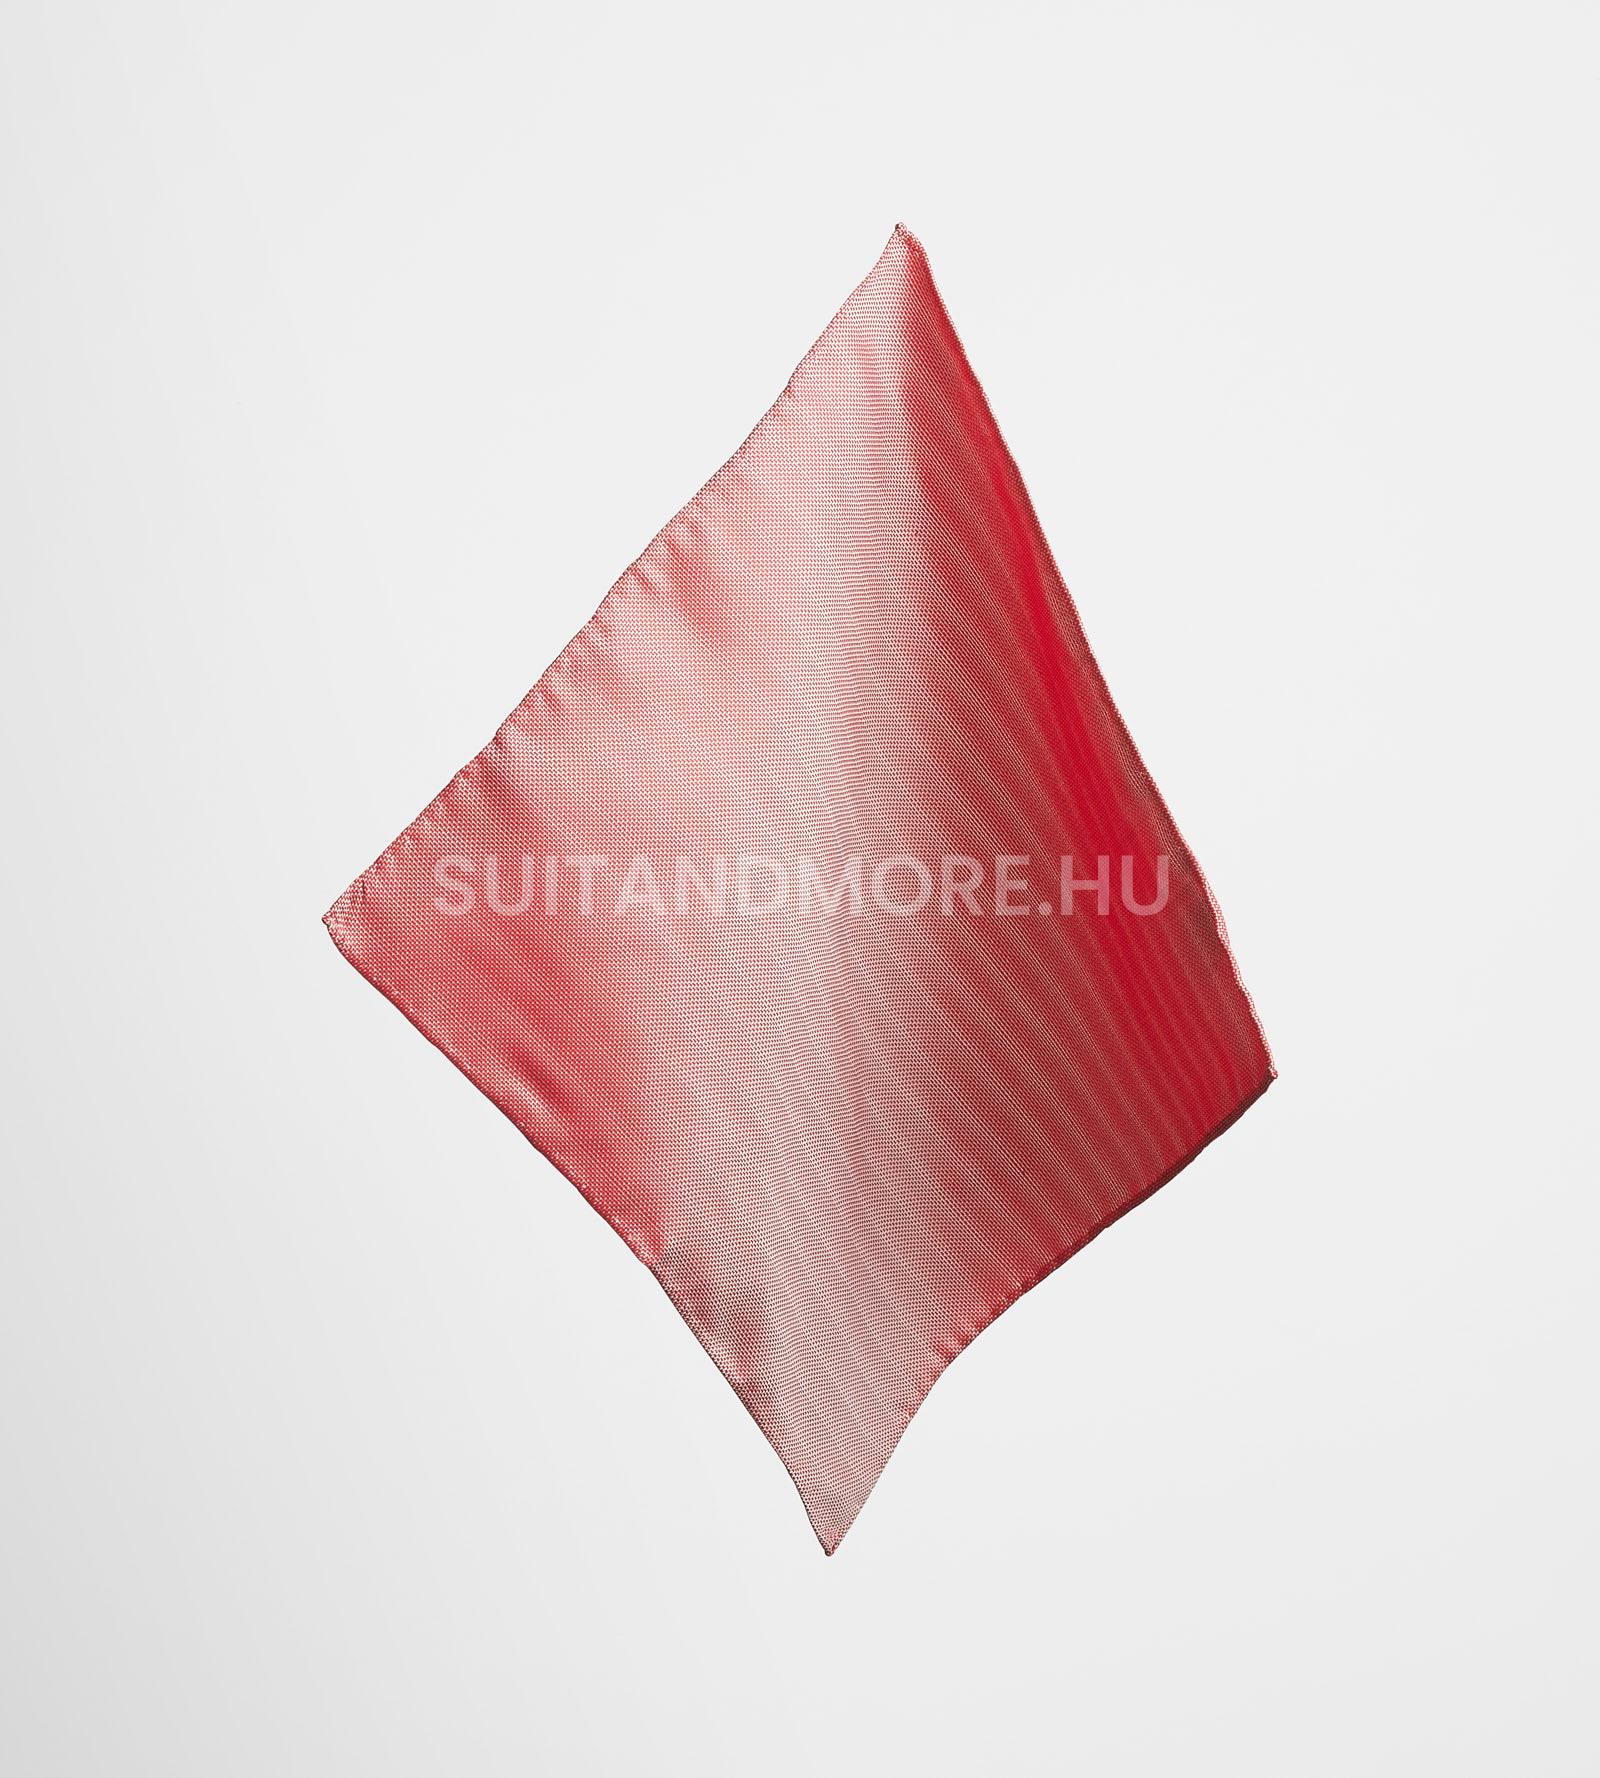 olymp-piros-selyem-diszzsebkendo-1758-51-35-01